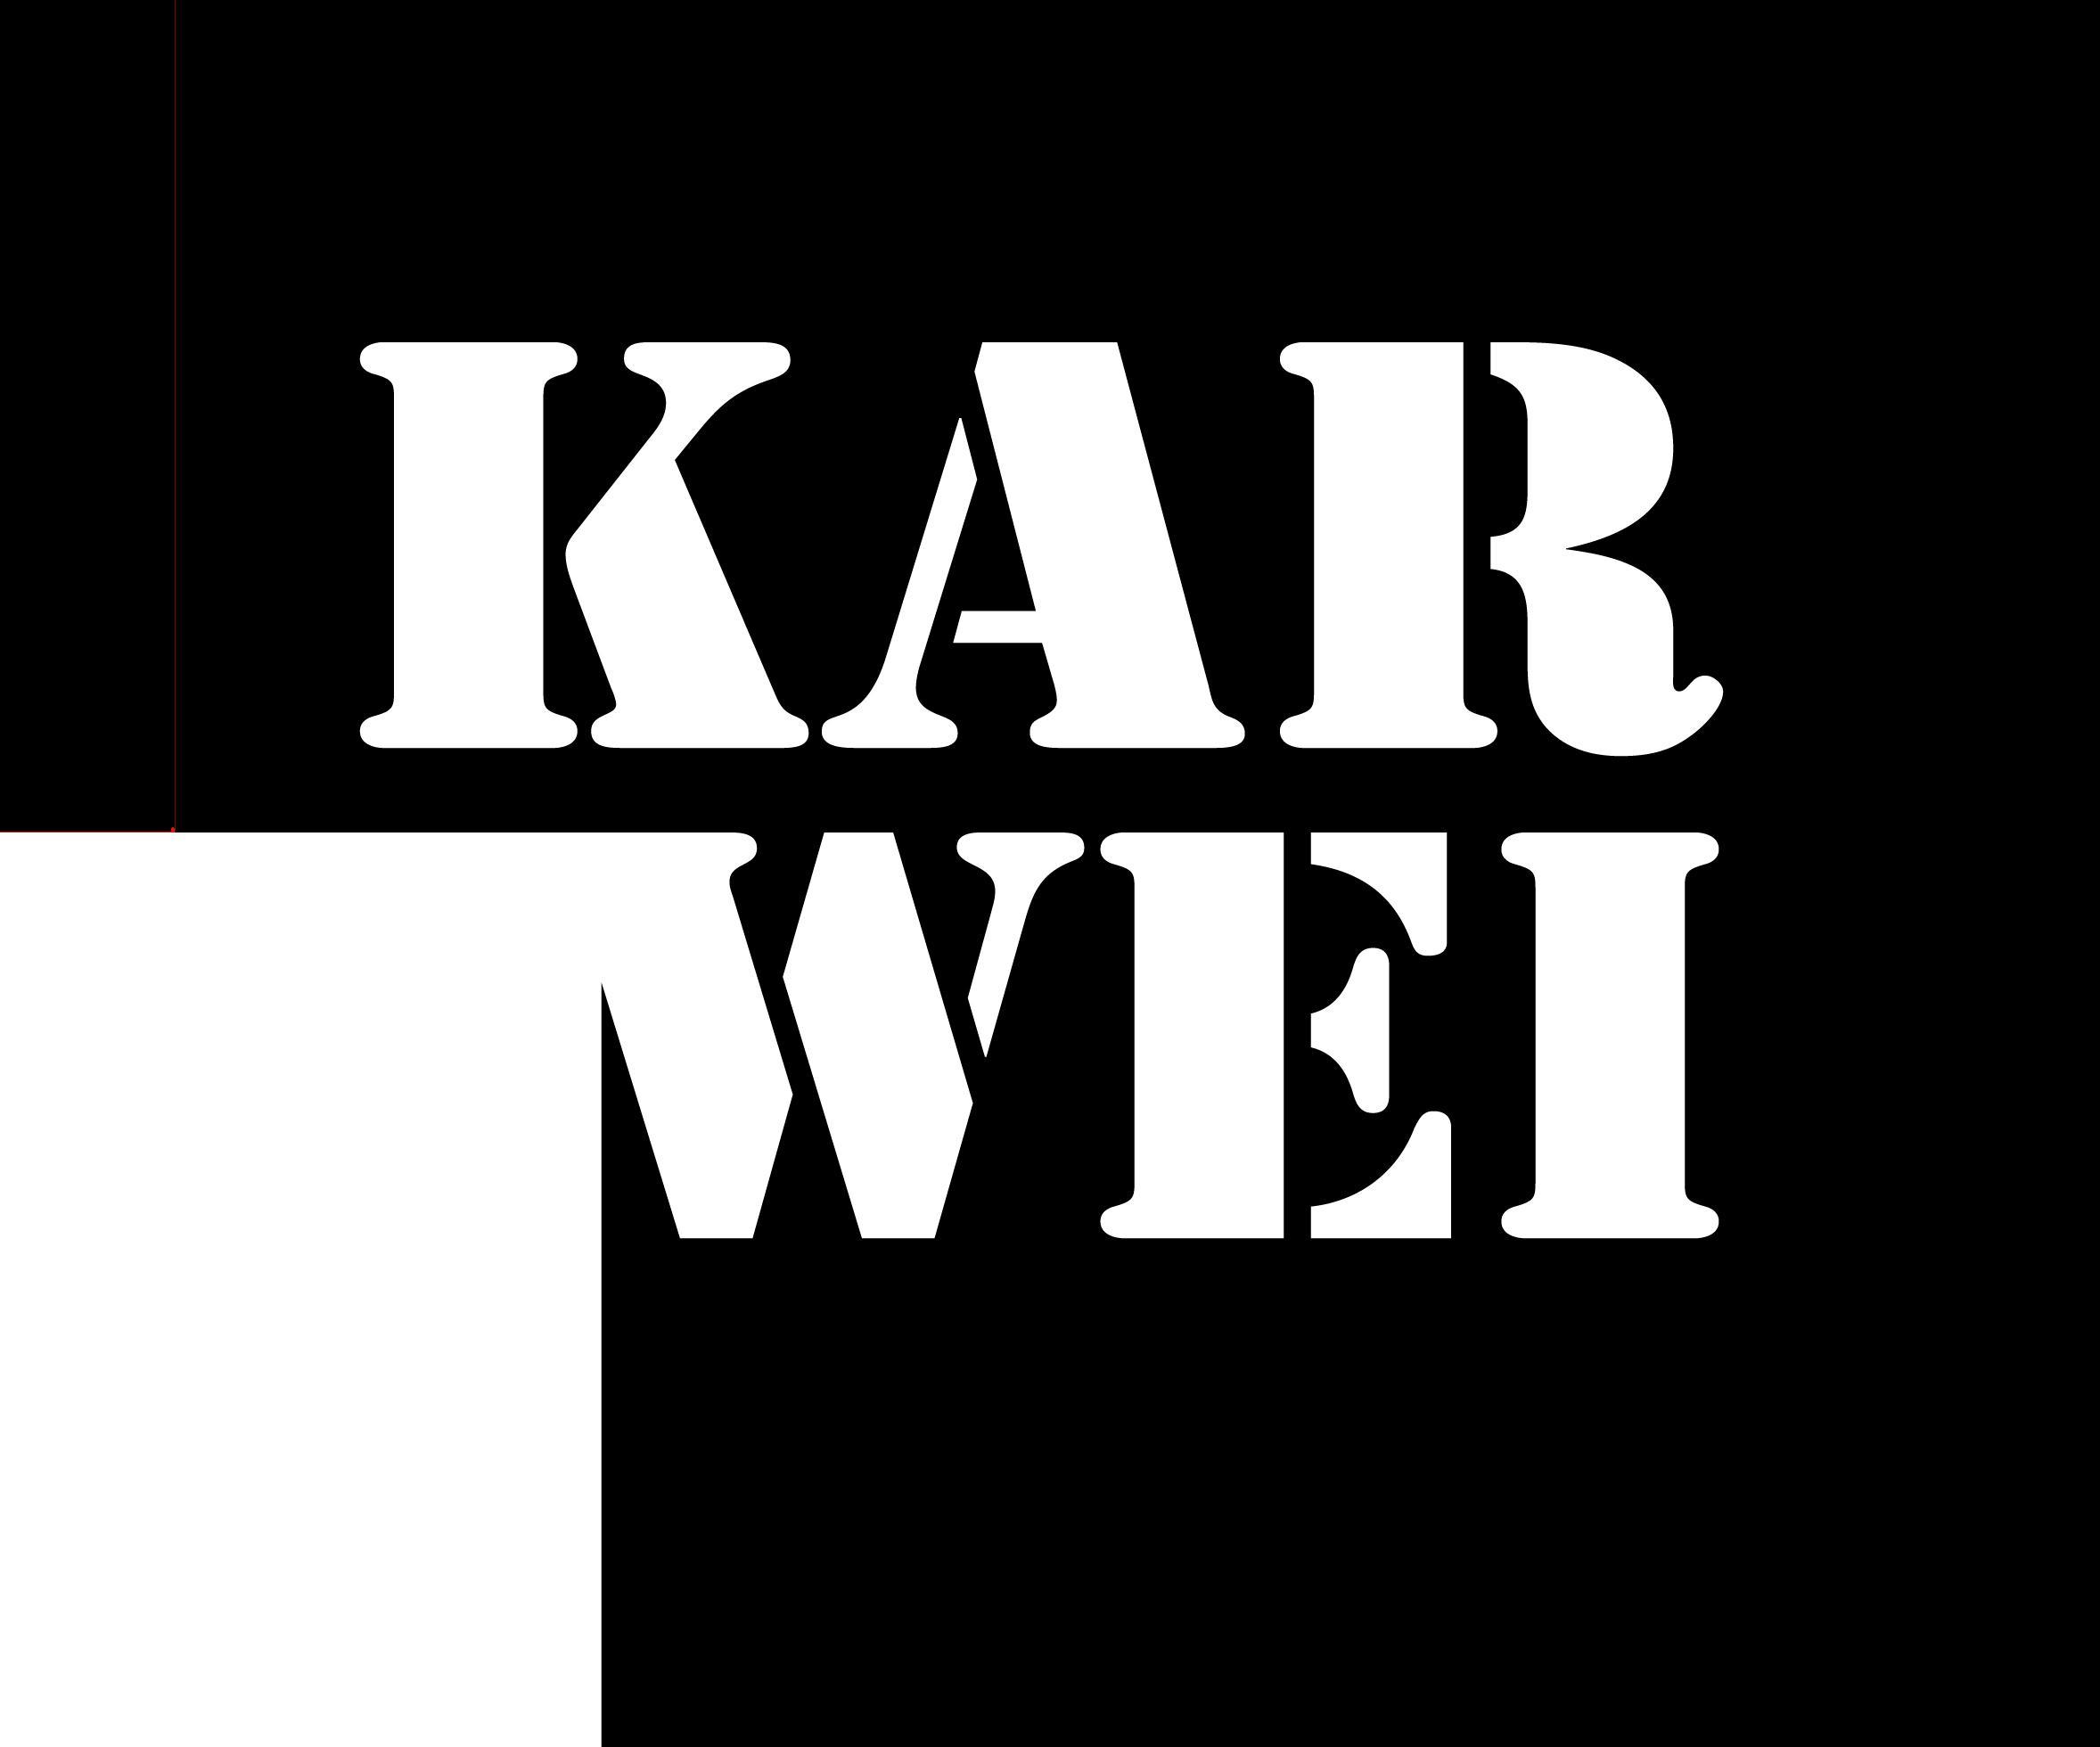 Waardebon voor € 5 korting @ Karwei